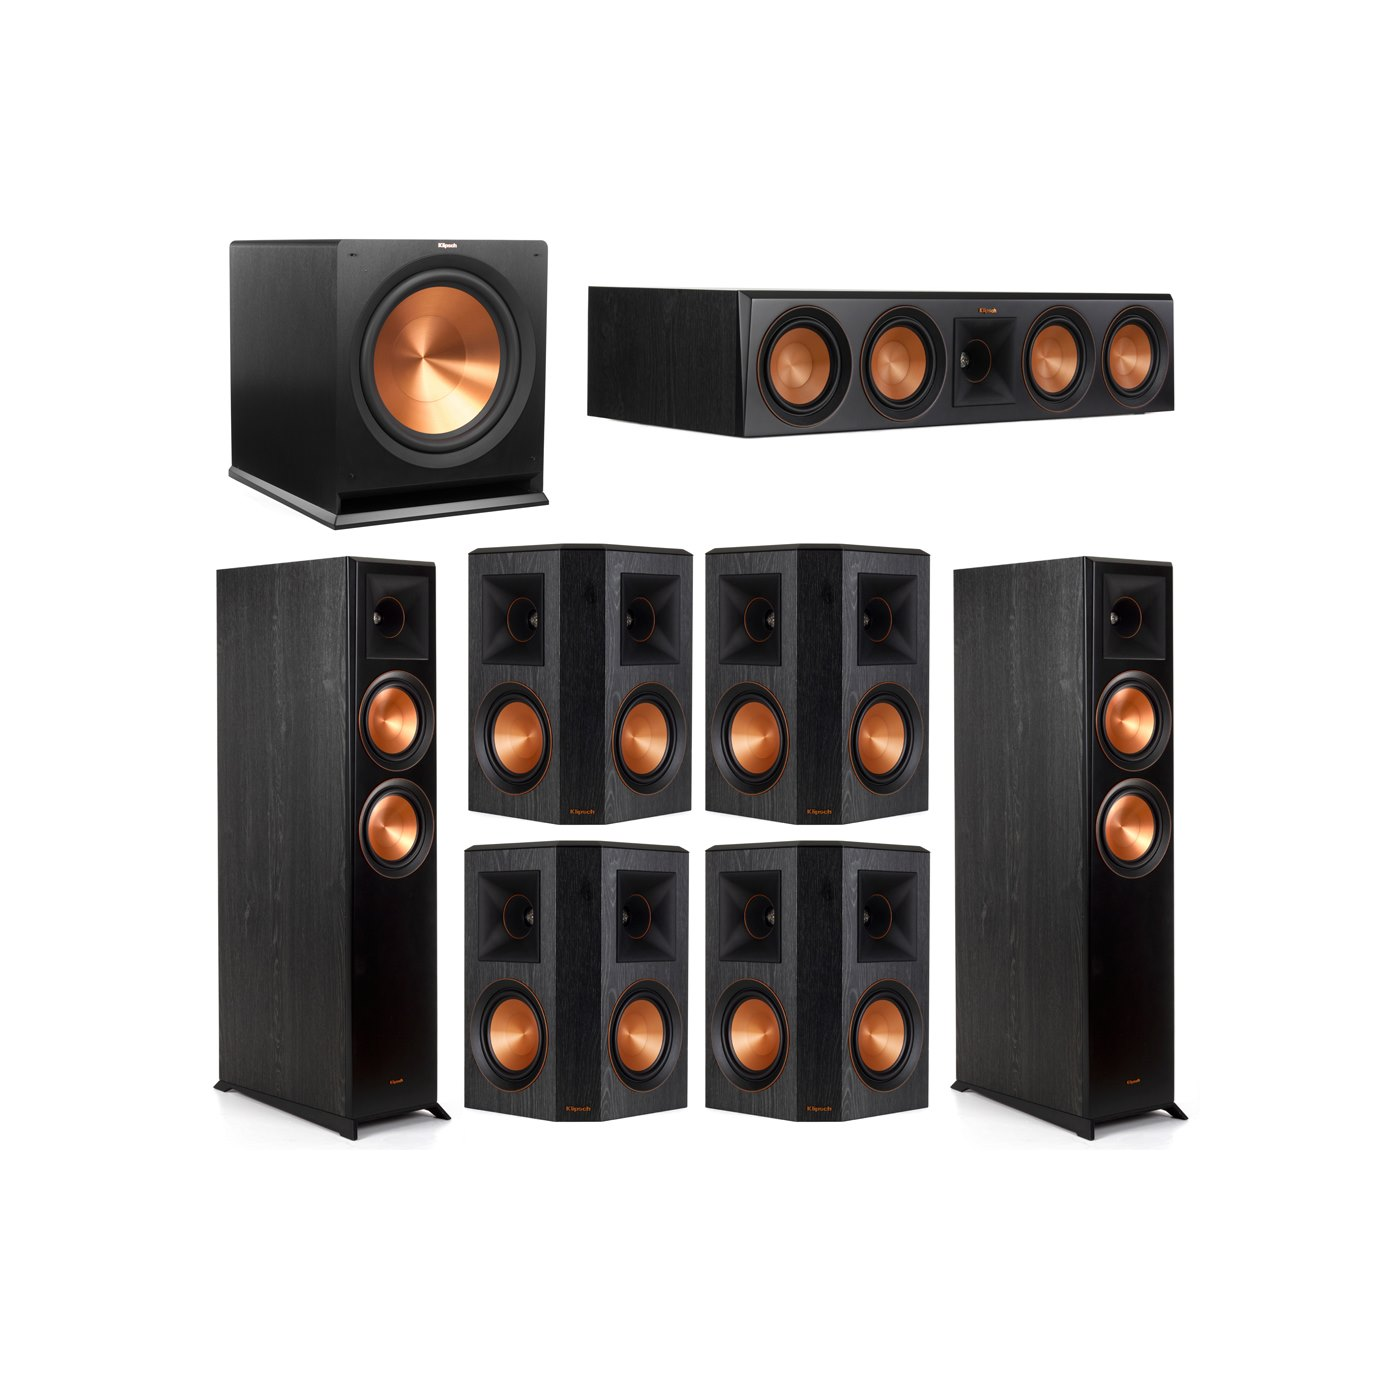 Klipsch 7.1 System with 2 RP-6000F Floorstanding Speakers, 1 Klipsch RP-504C Center Speaker, 4 Klipsch RP-502S Surround Speakers, 1 Klipsch R-115SW Subwoofer